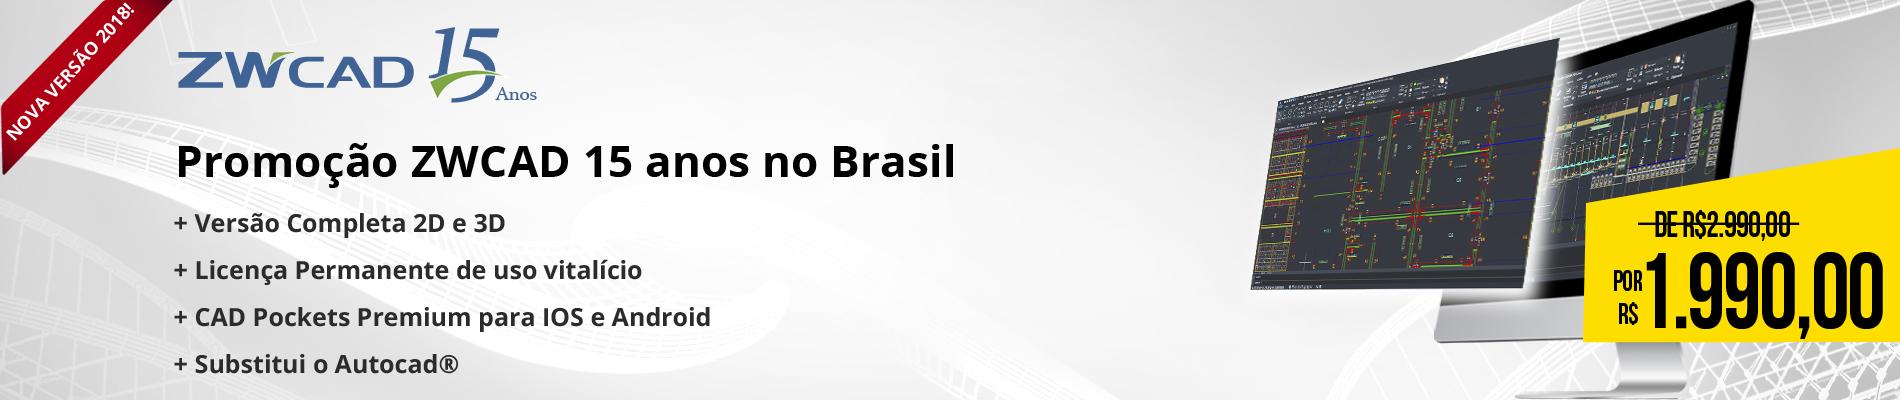 banner_1900x400_promocional